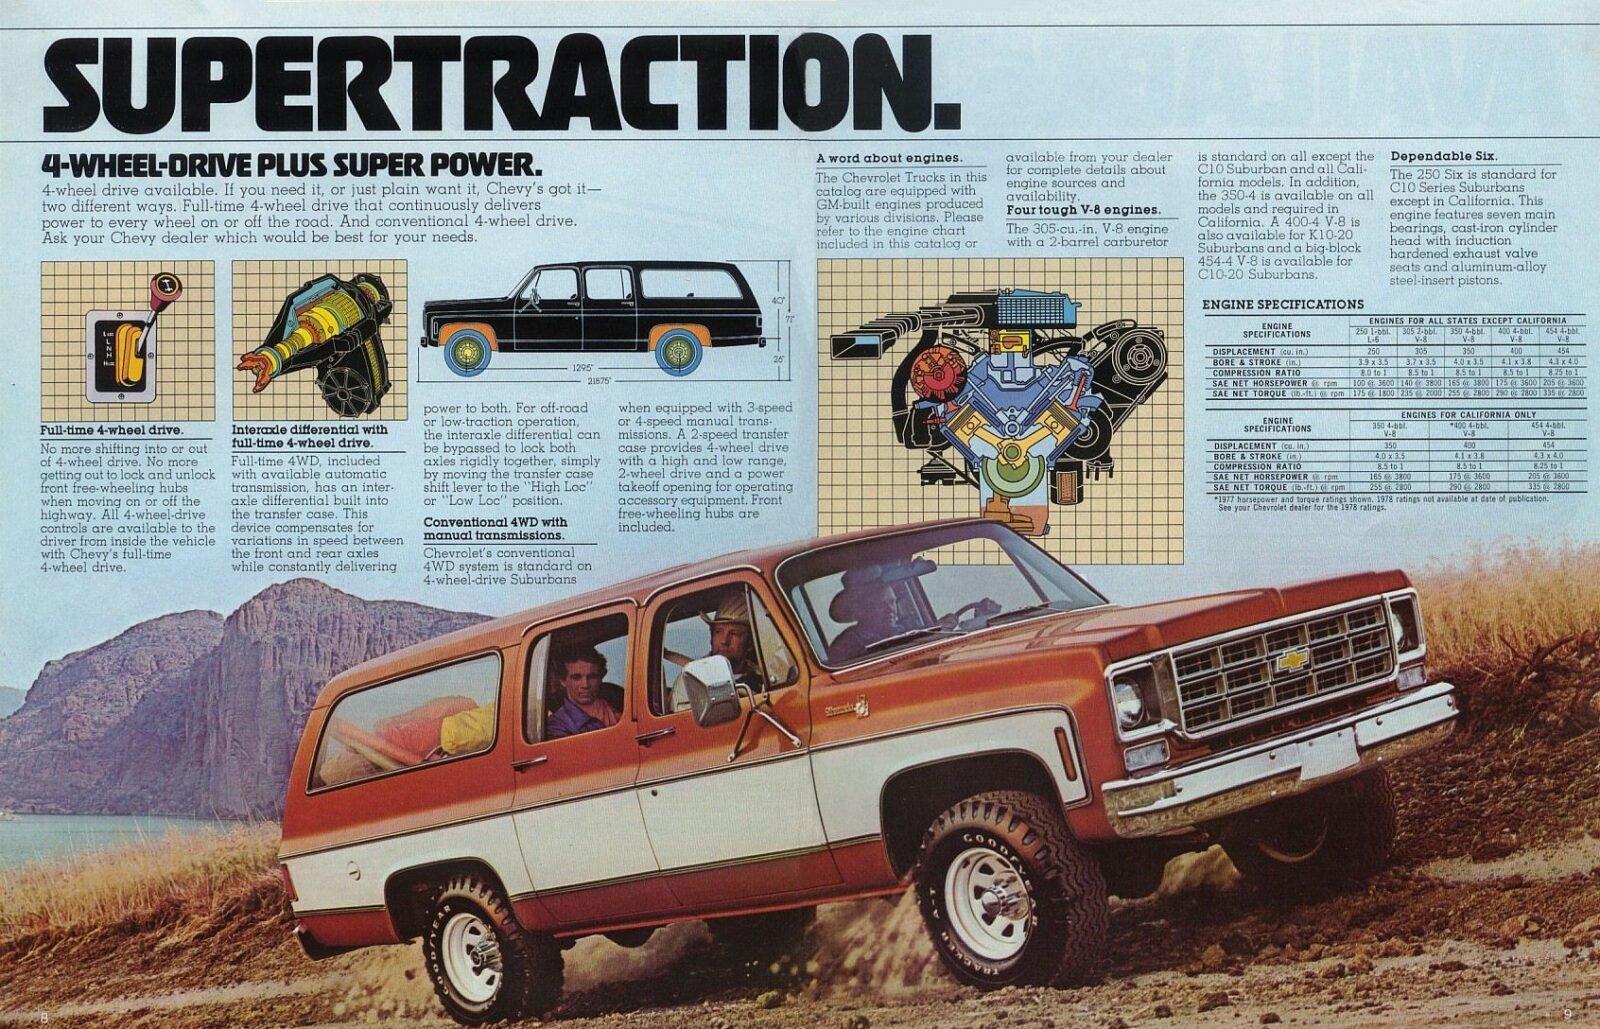 Chevrolet Suburban seventh generation